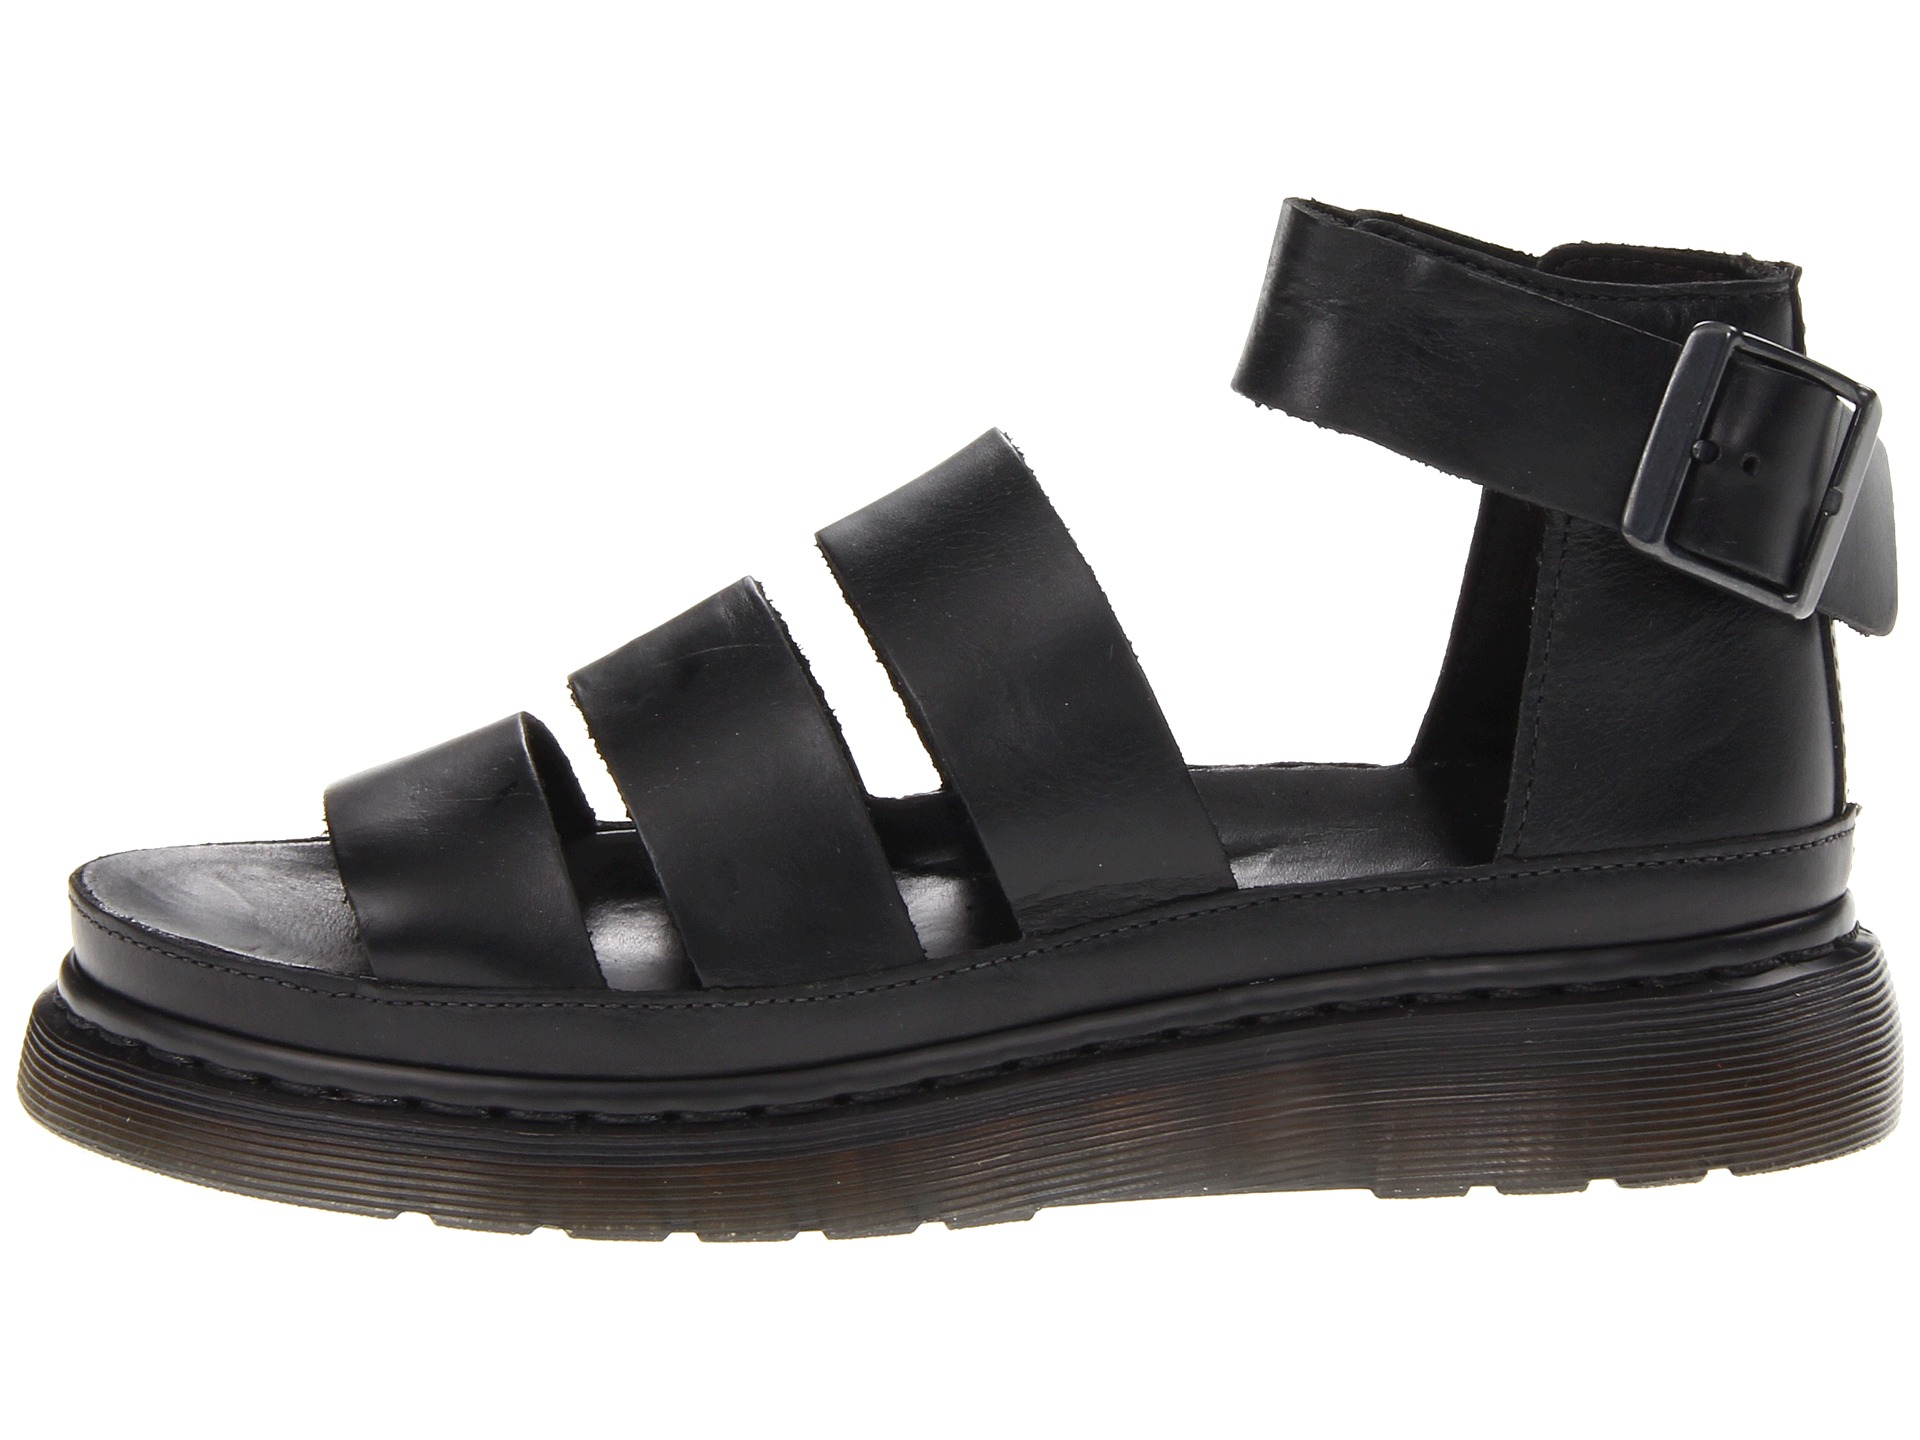 Lastest Doc Martens Shoes Sandals 1990 Brown Leather UK Size 5